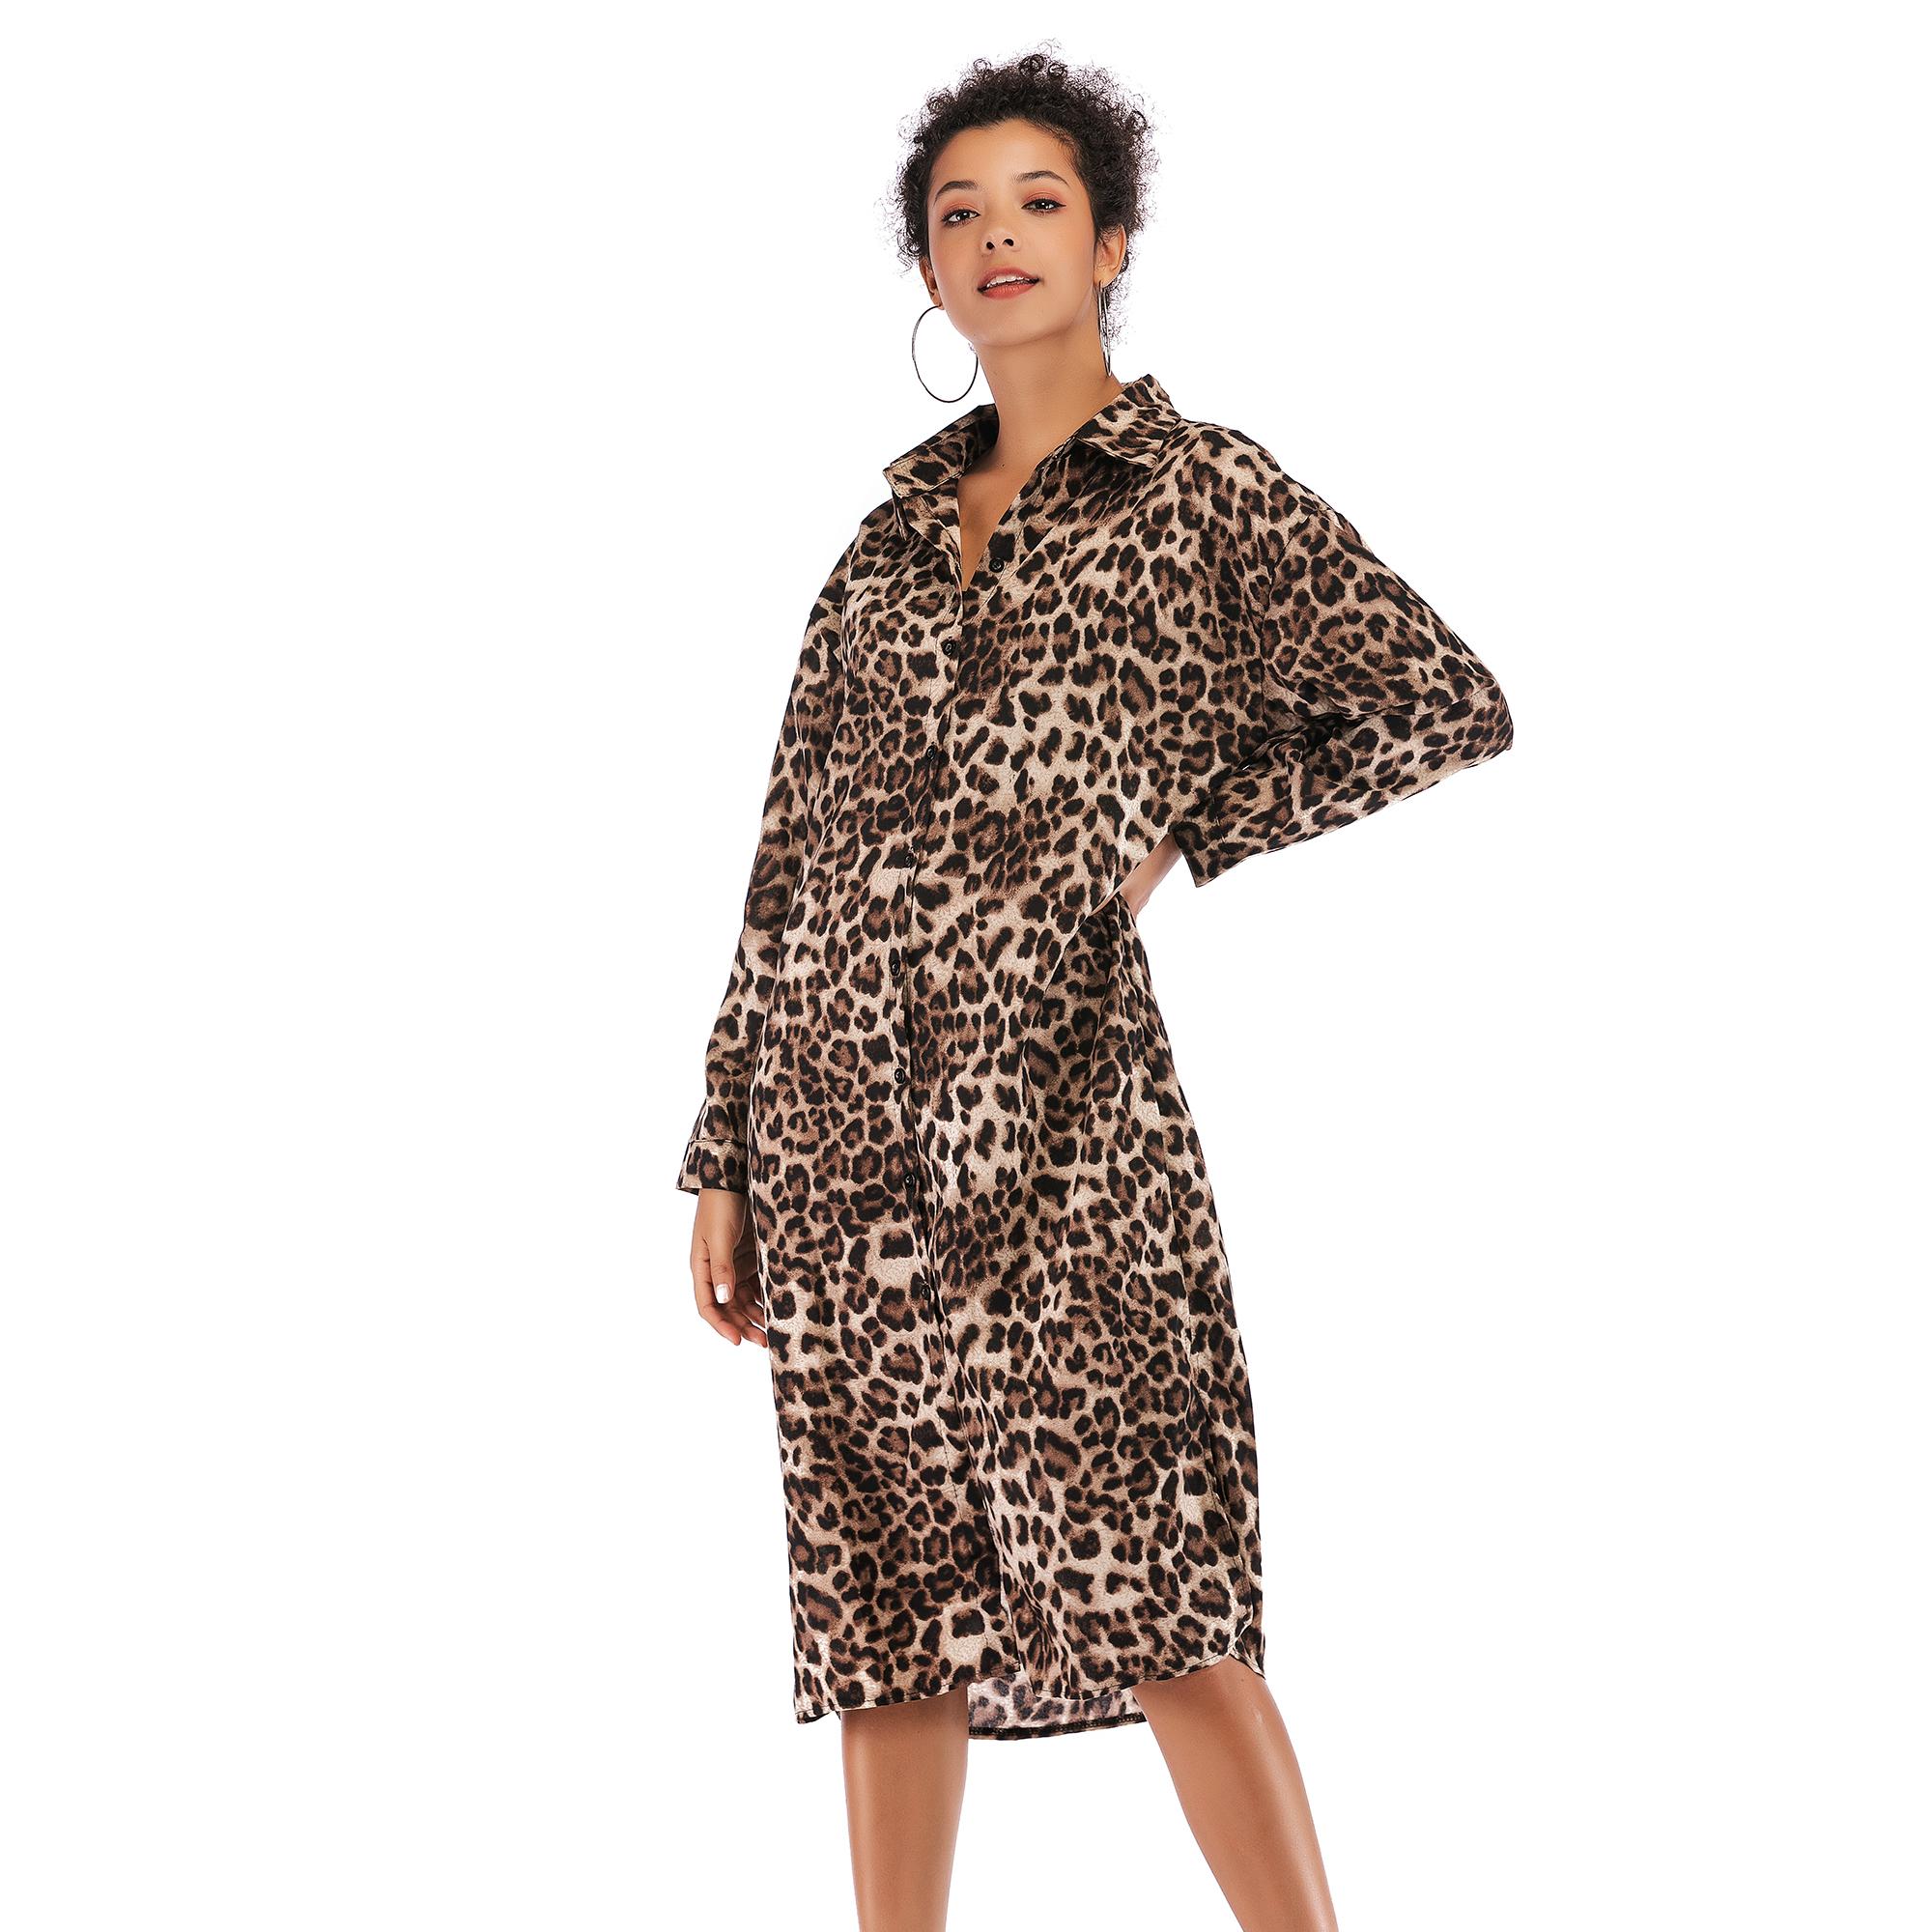 5925 ebay速卖通秋季新款女装 翻领系扣豹纹连衣裙修身开叉衬衫裙